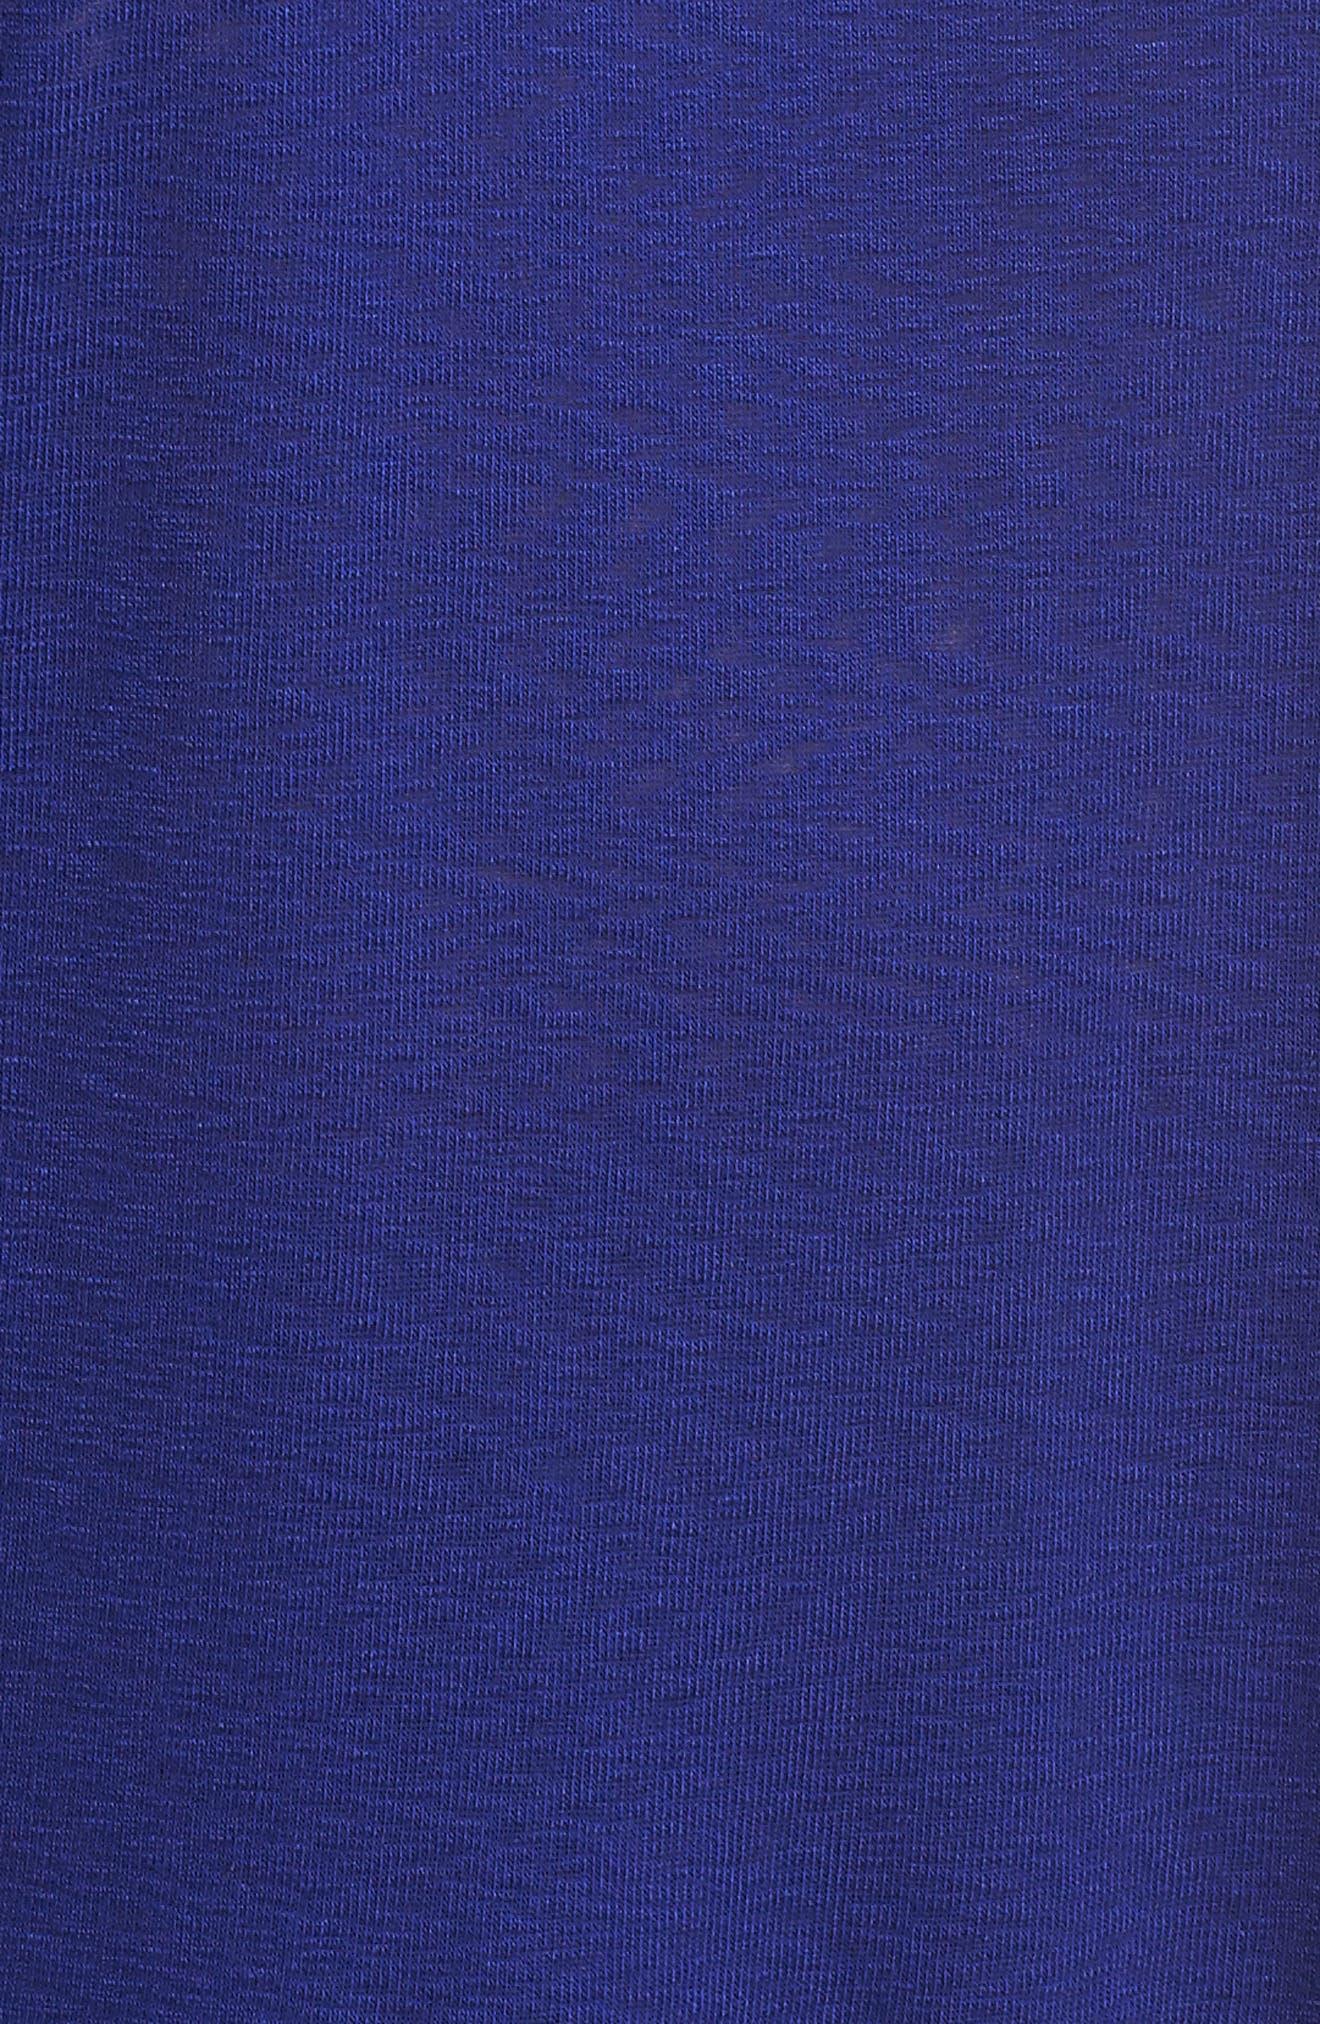 Flutter Sleeve Tee,                             Alternate thumbnail 5, color,                             ROYAL BLUE